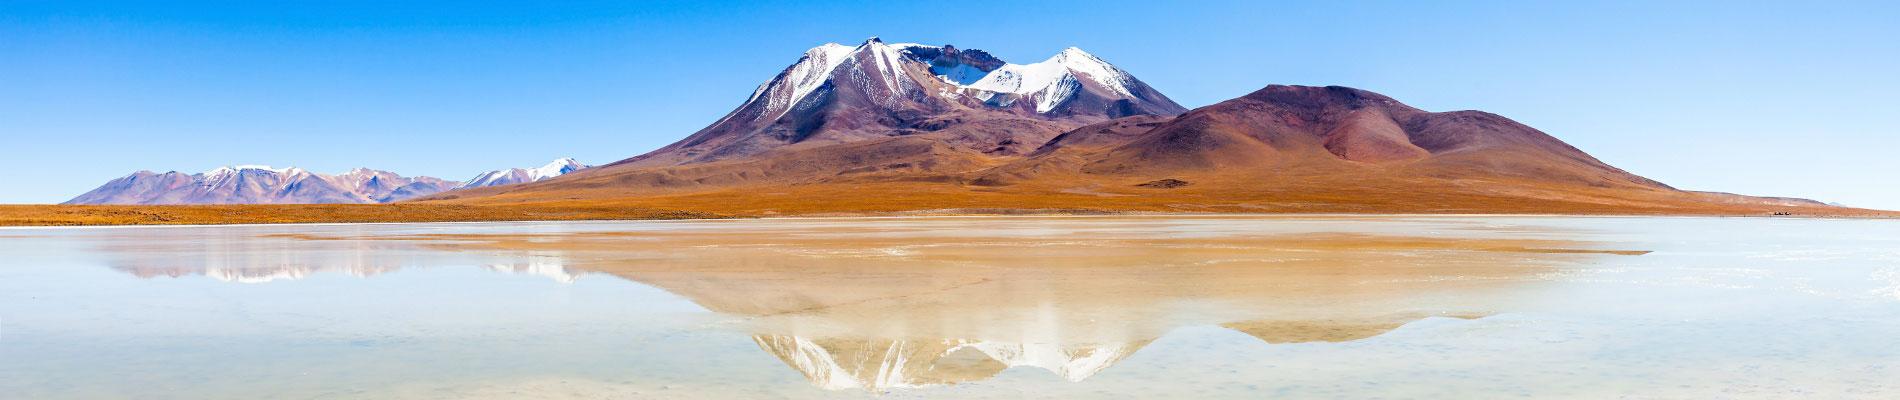 bolivie-altiplano-st